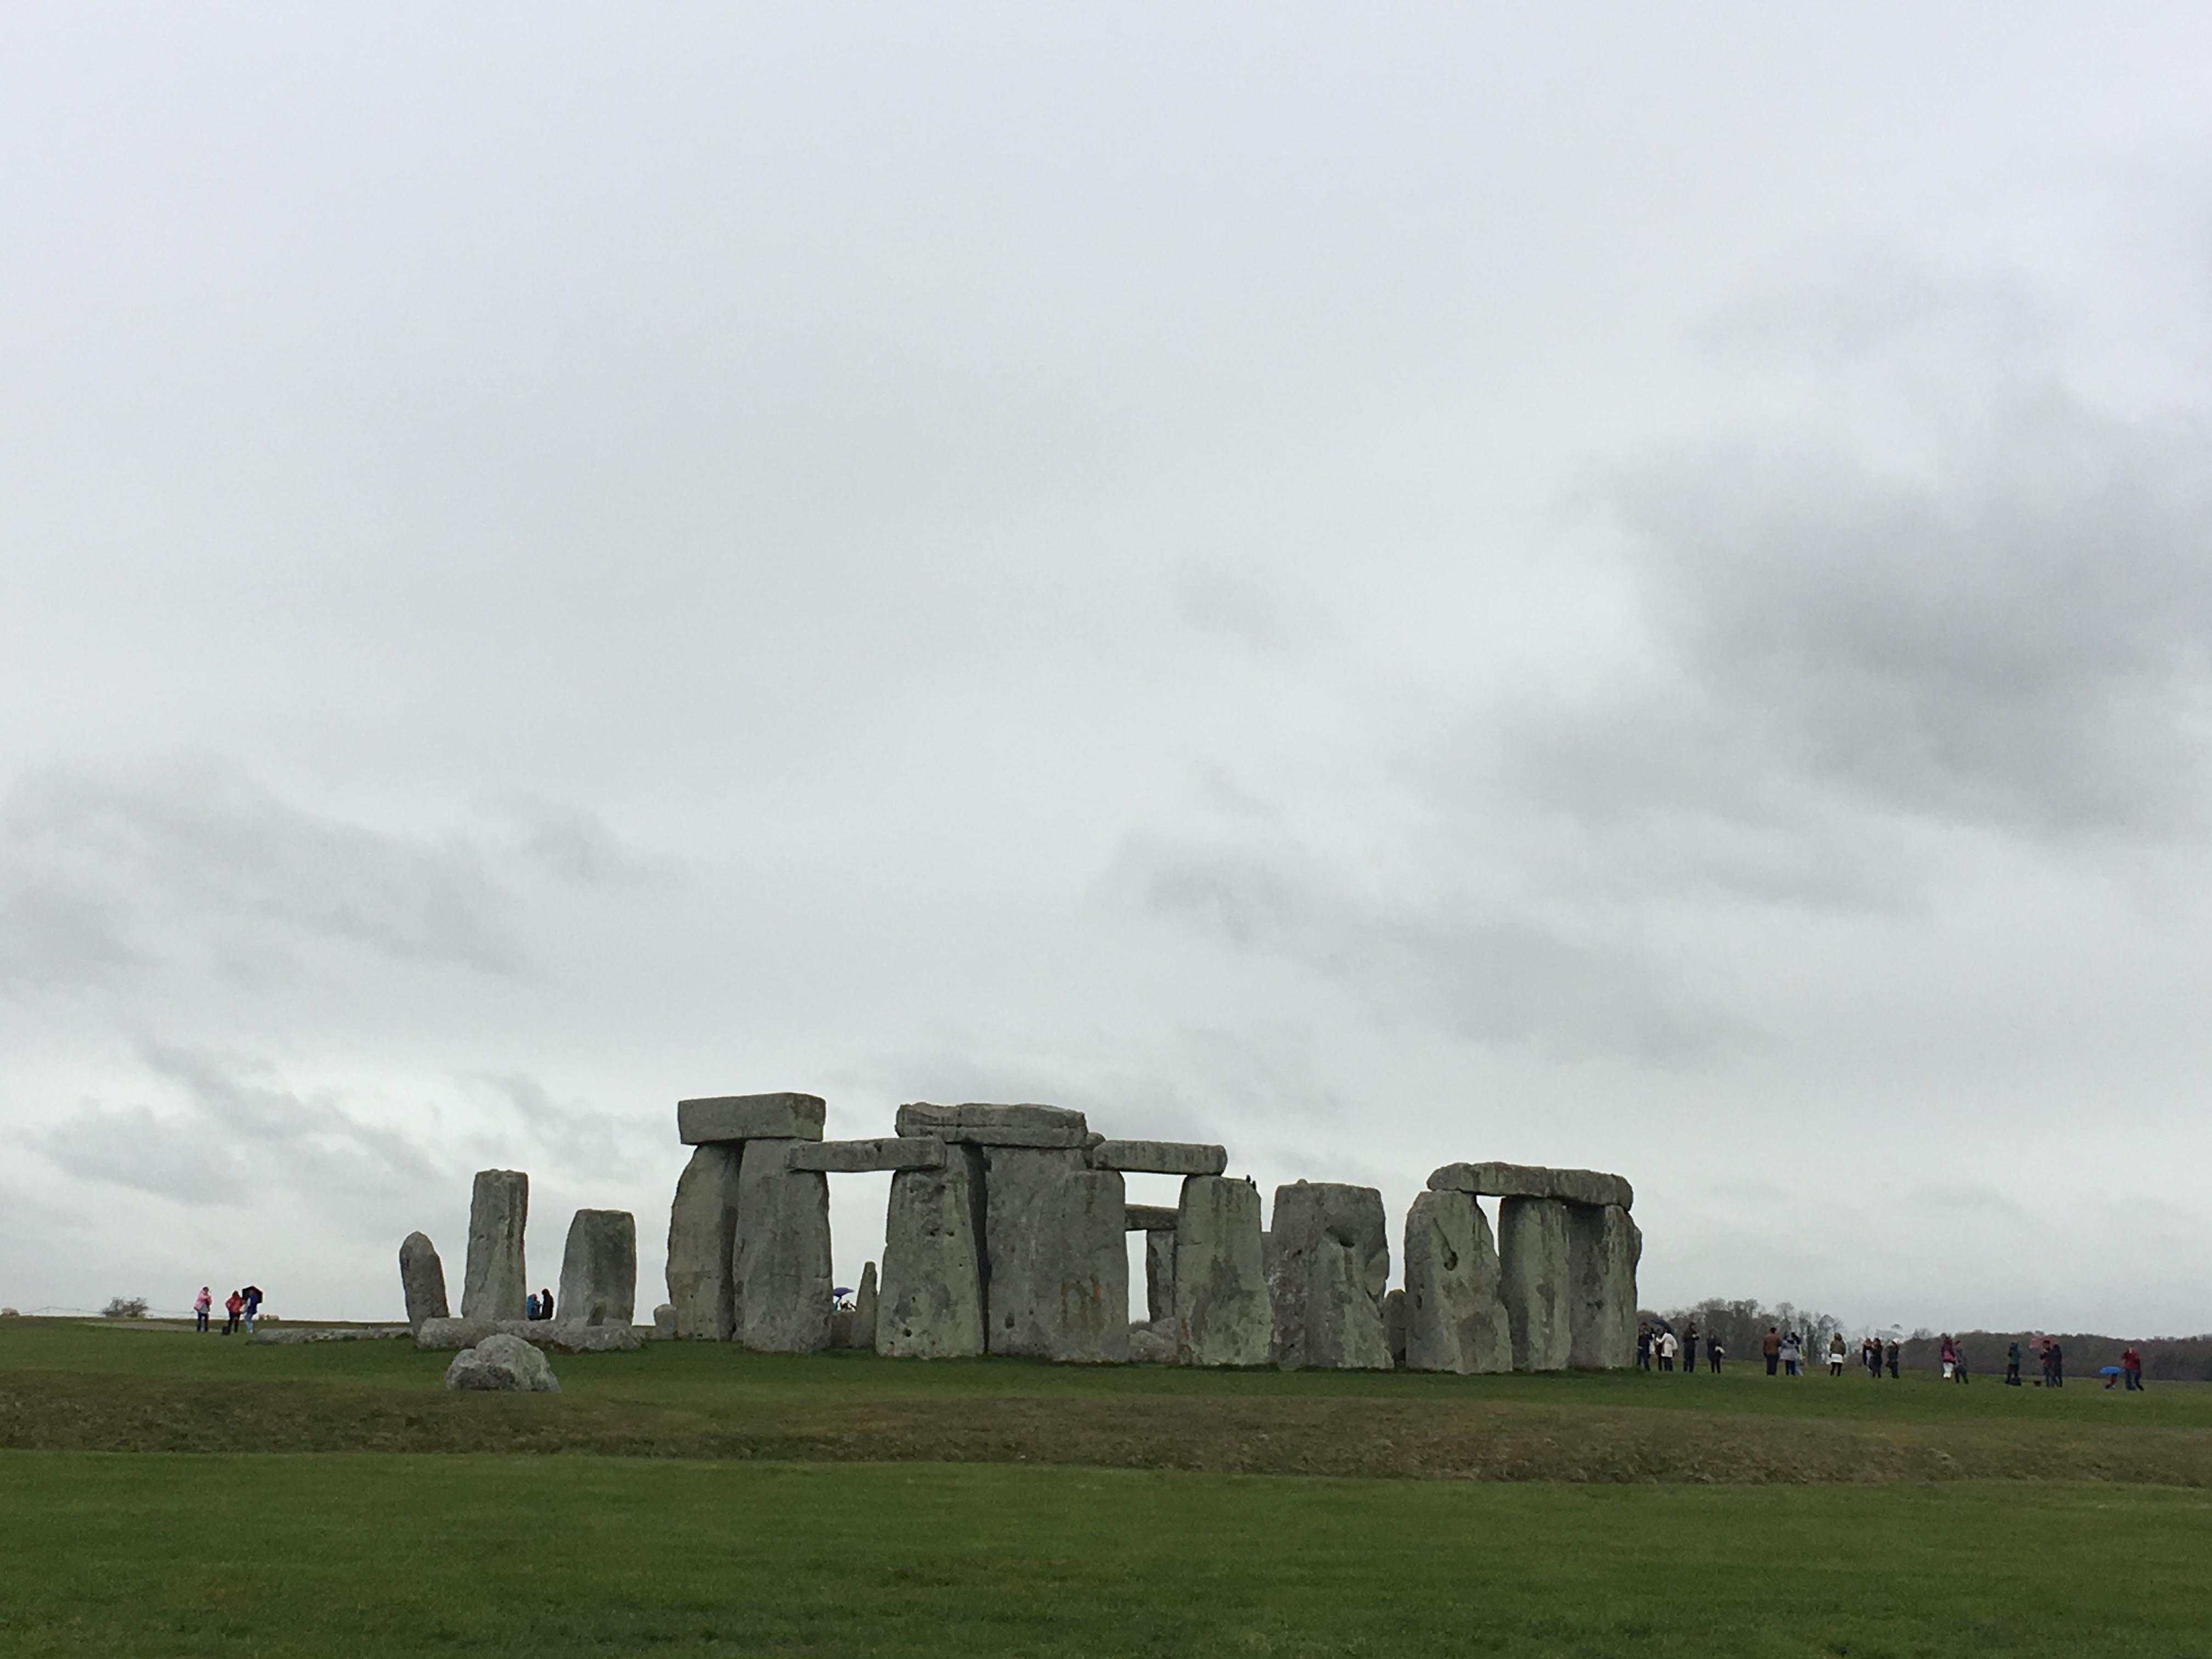 Stonehenge, Avebury and Associated Sites - United Kingdom of Great Britain and Northern Ireland